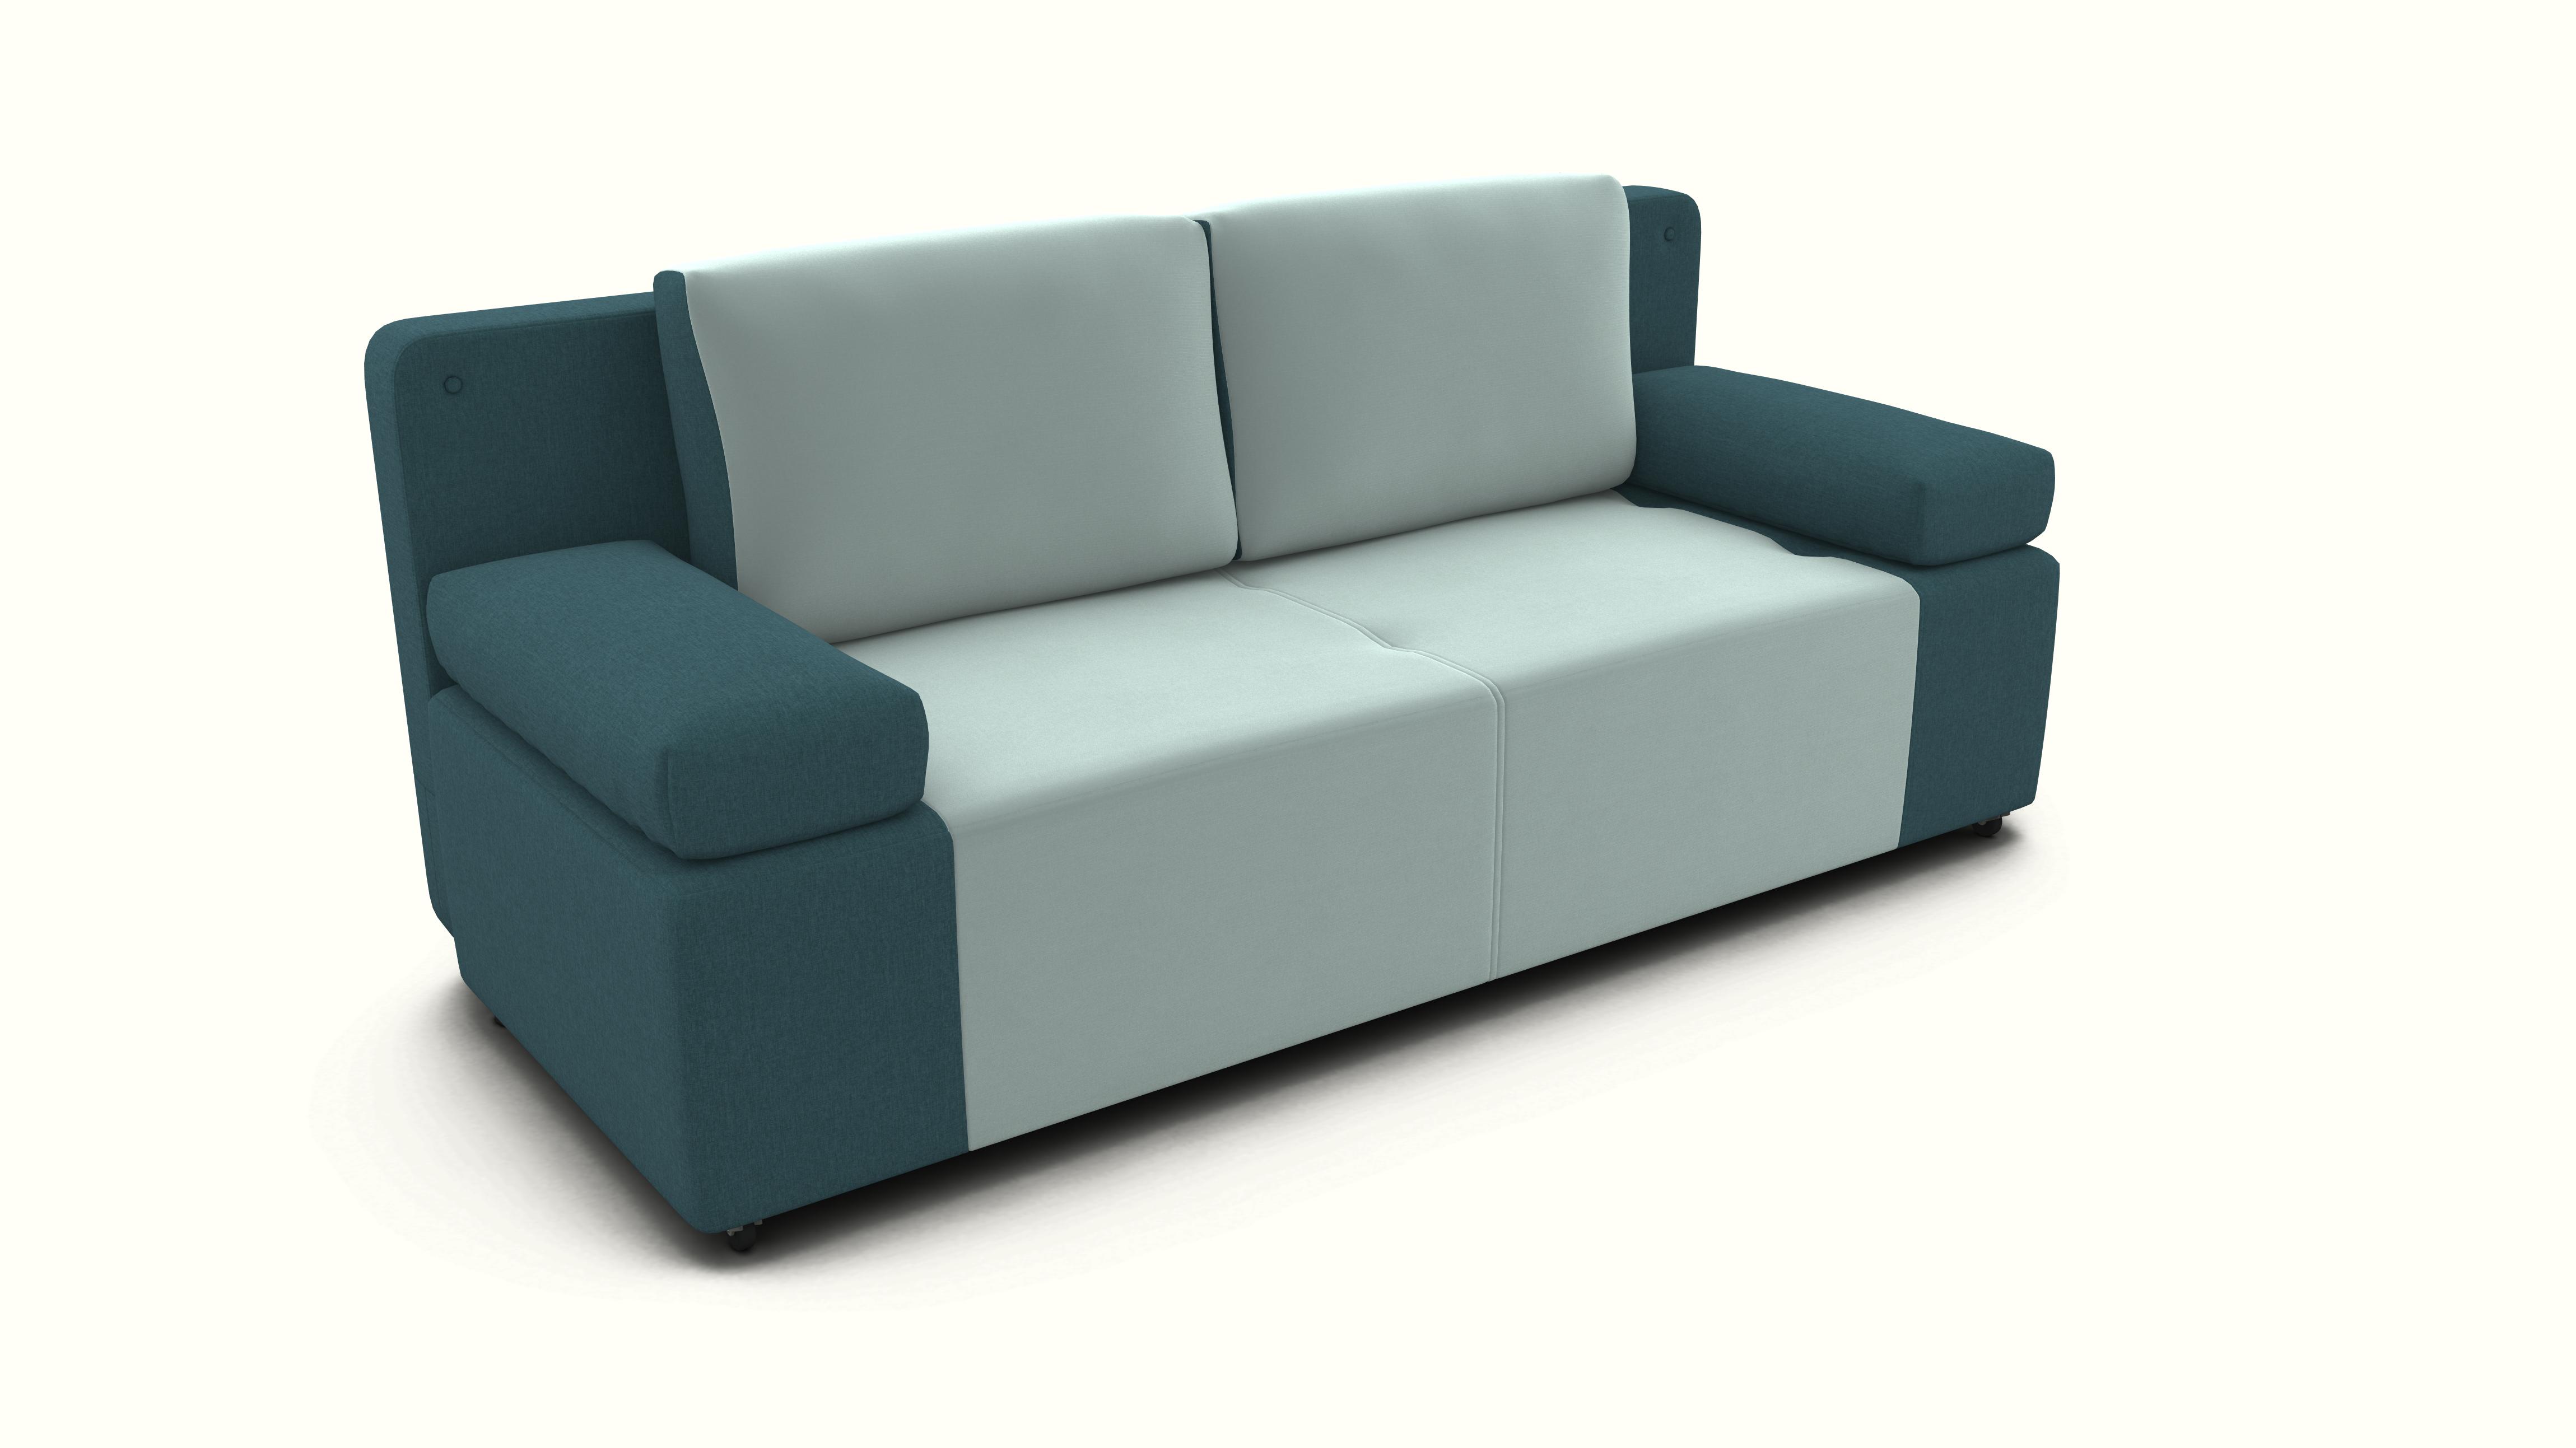 Прямой диван Сейд 3 Столплит R0000255605